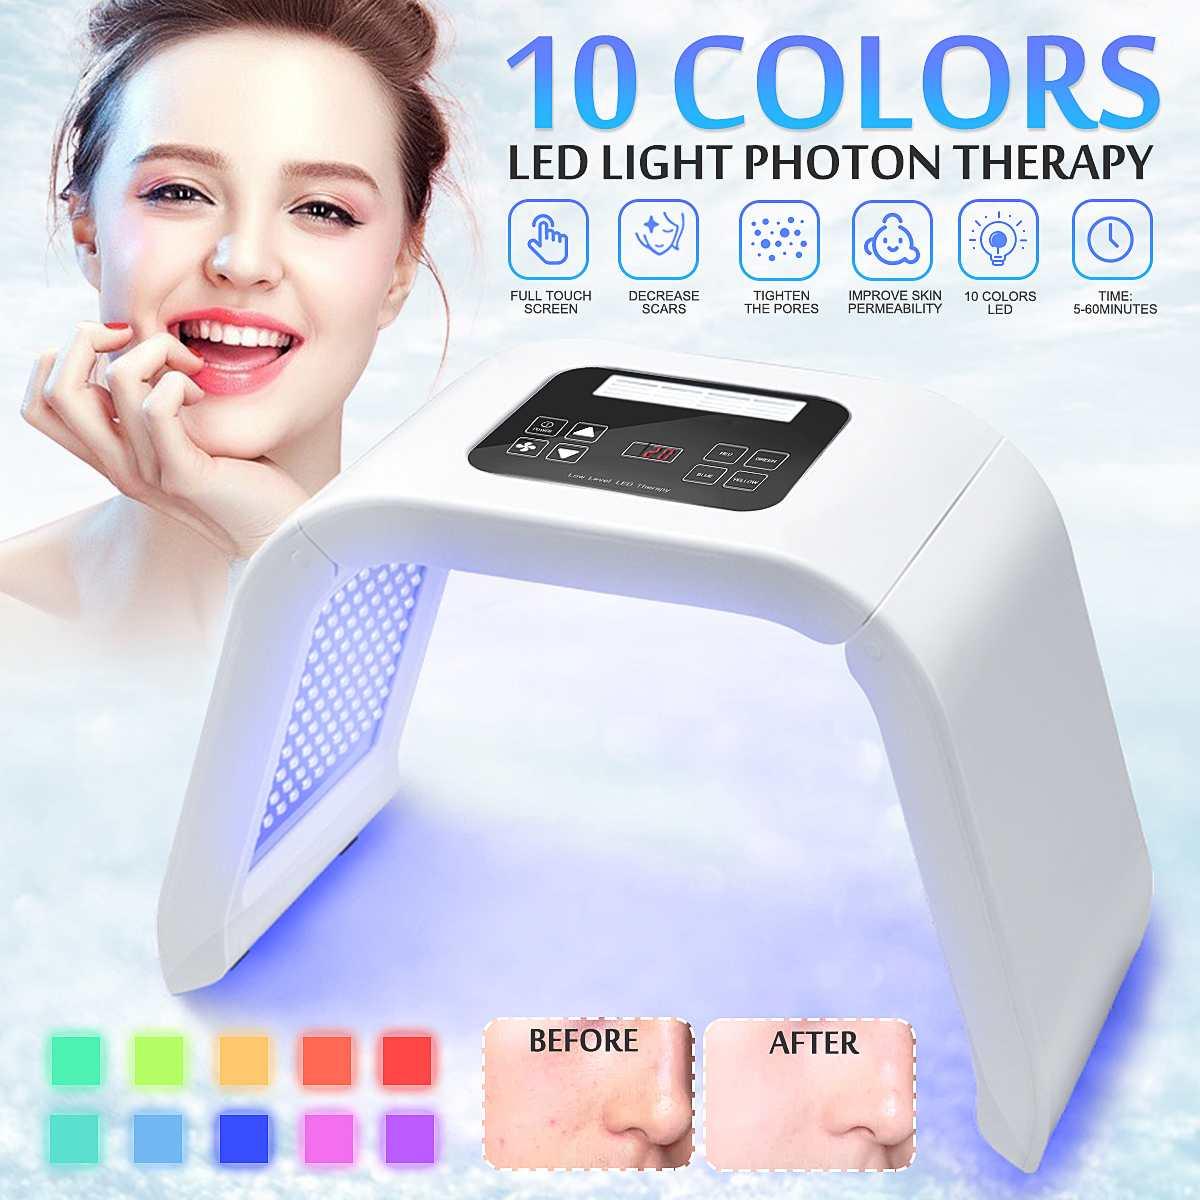 NEW Professional Photon PDT Led Light Facial Mask Machin 10 Colors Facial Skin Rejuvenation Light Therapy PDT Beauty Machine